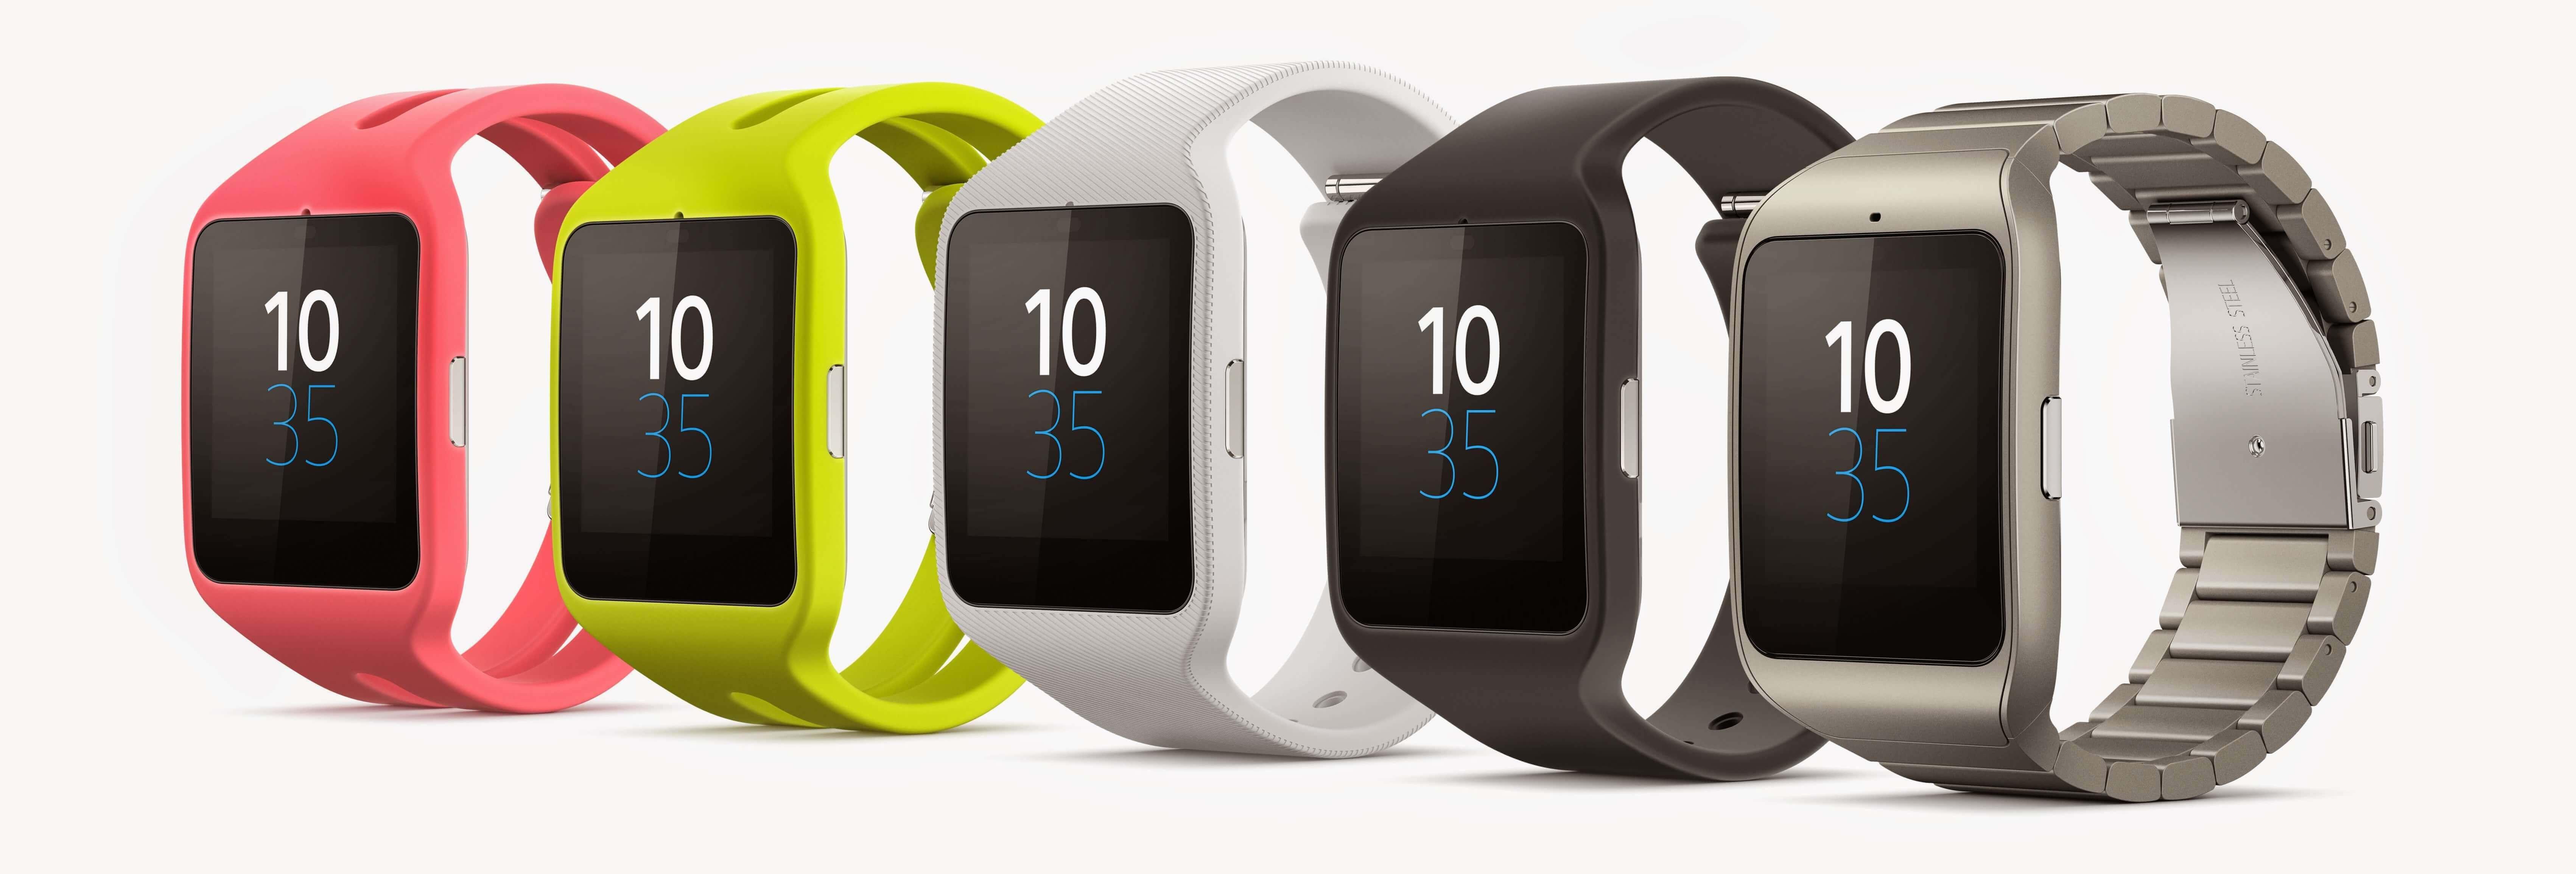 Sony Smartwatch 3 Modellübersicht